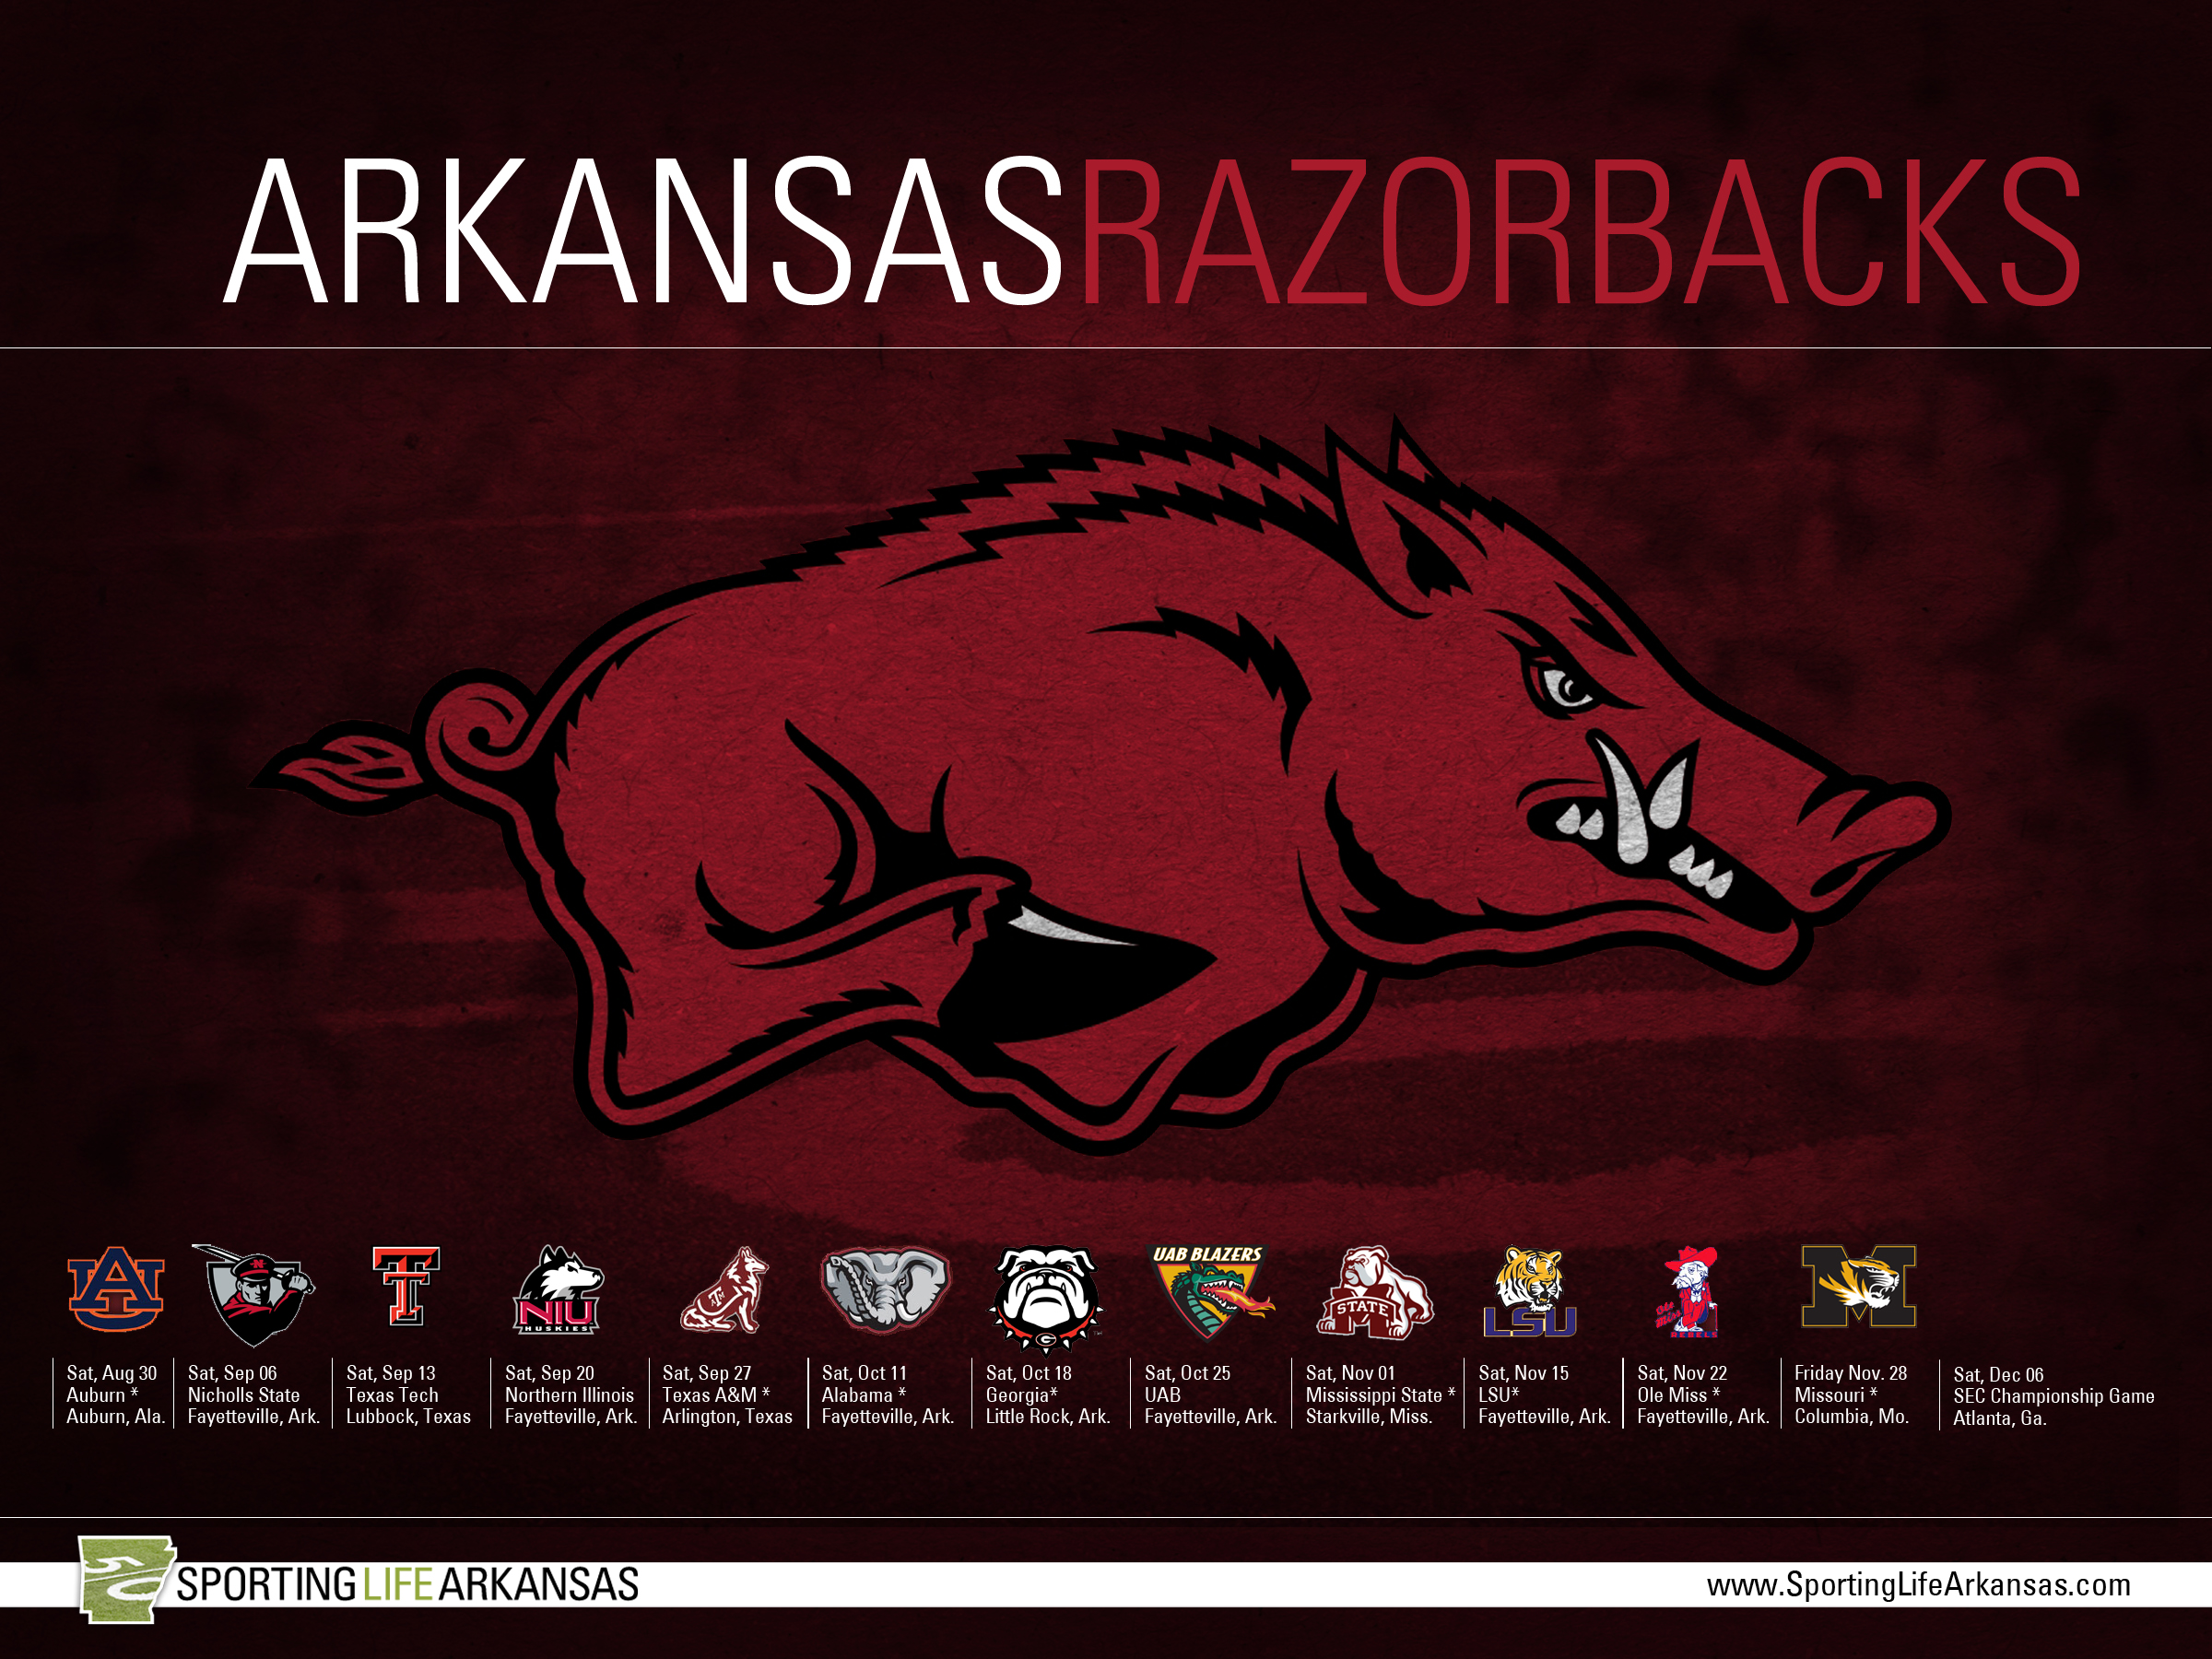 Arkansas Razorback Football Schedule